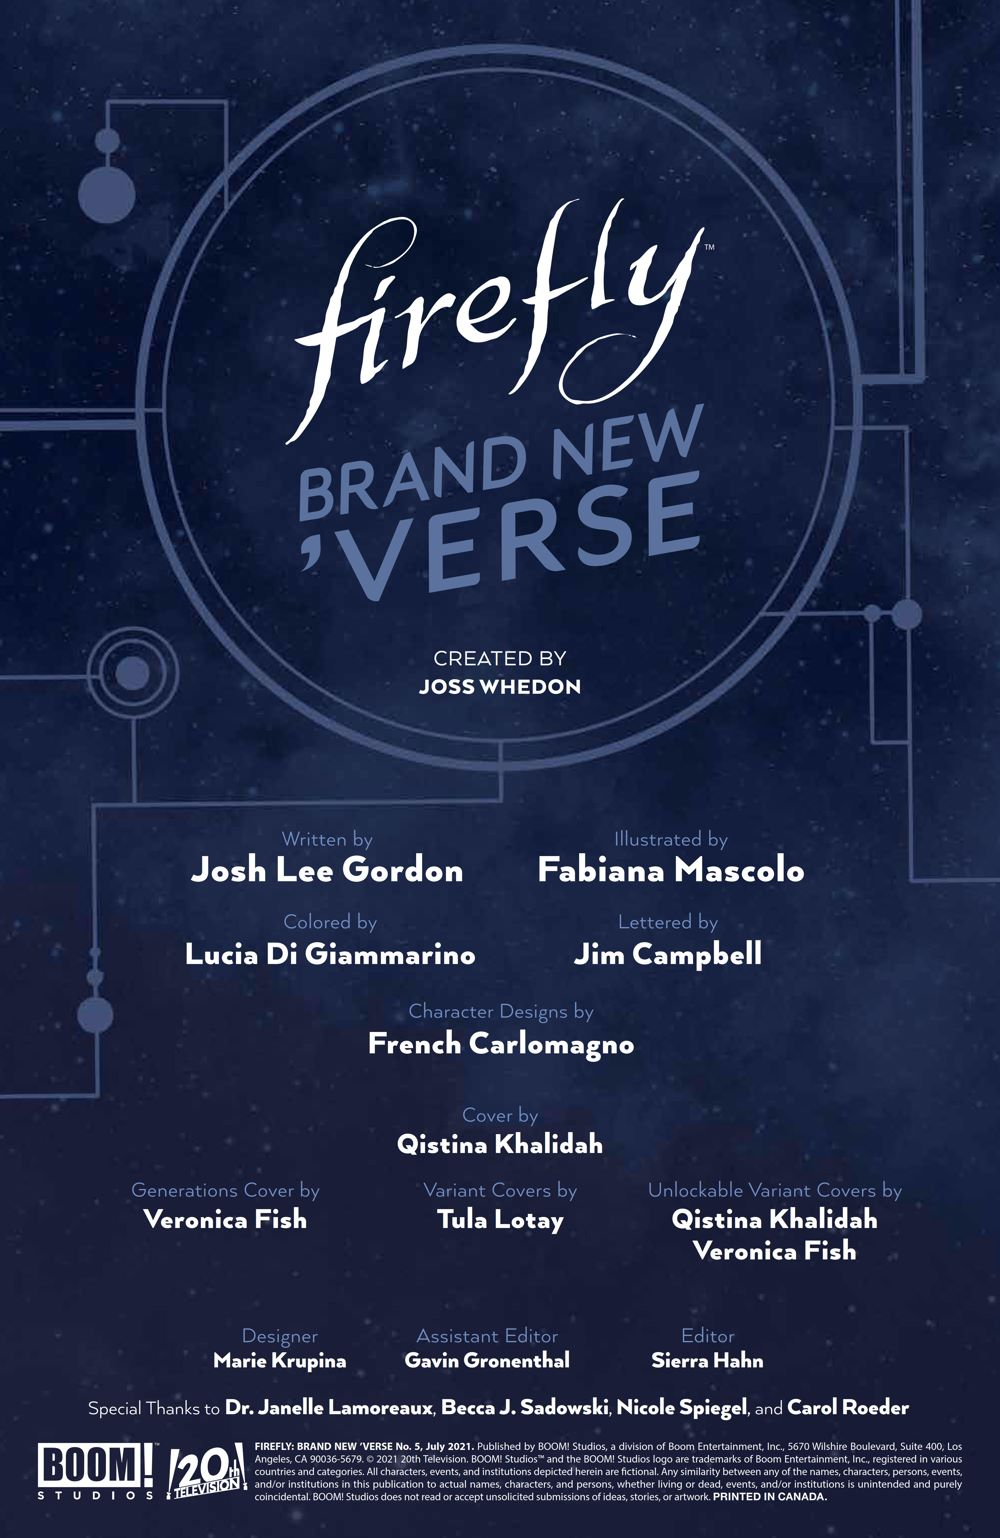 Firefly_BrandNewVerse_005_PRESS_2 ComicList Previews: FIREFLY BRAND NEW 'VERSE #5 (OF 6)